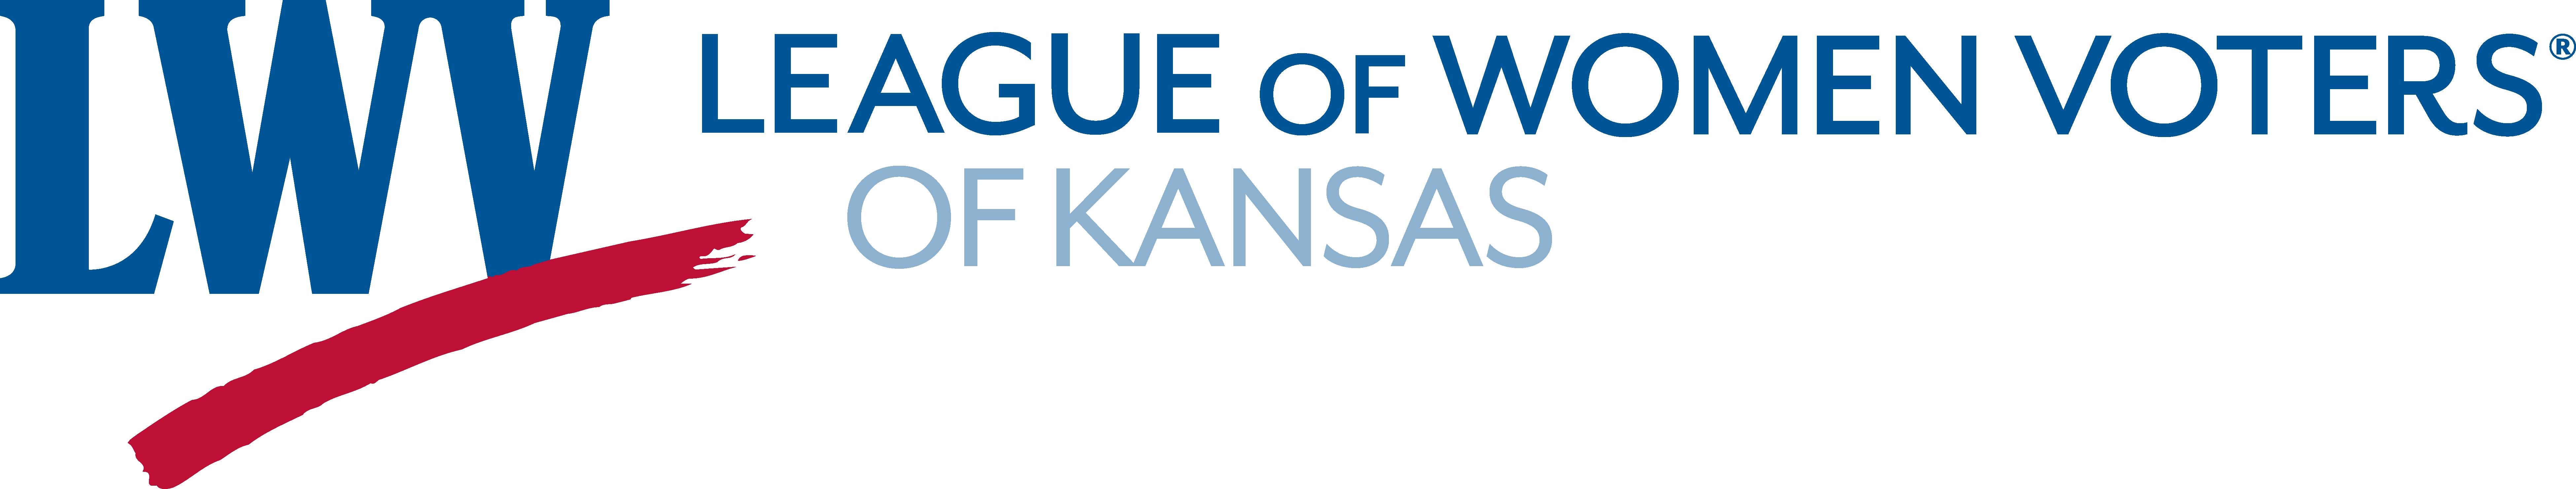 LWVKS League logo